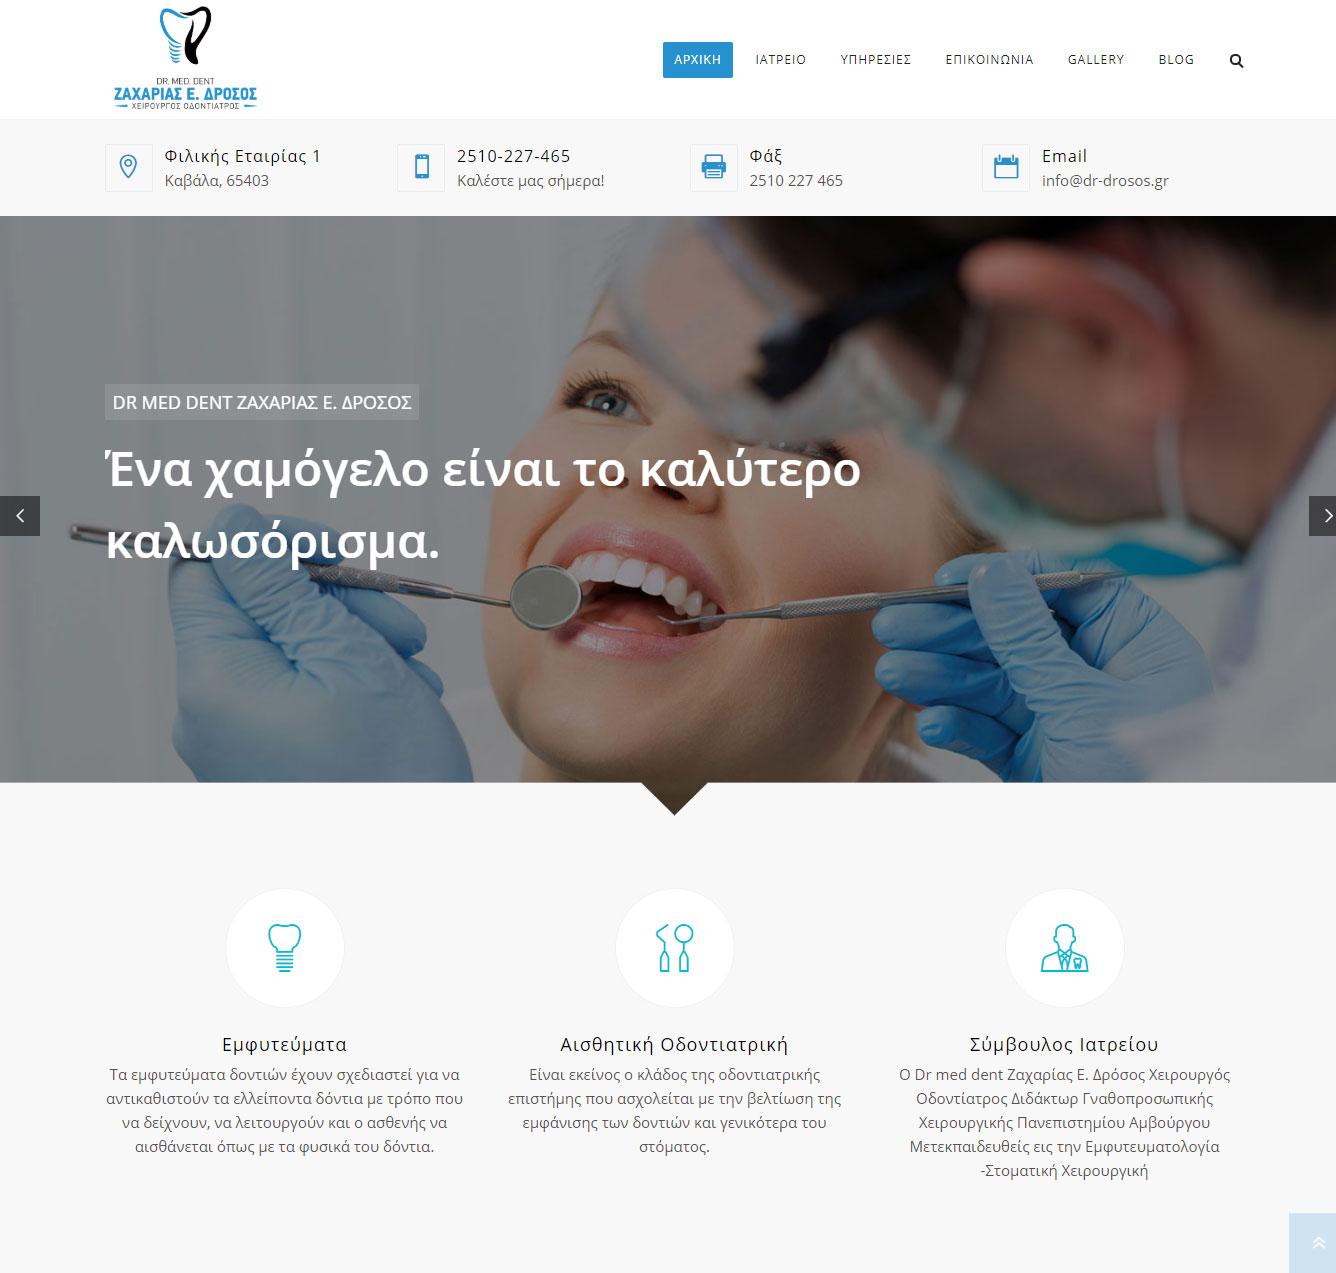 dr-drosos.gr